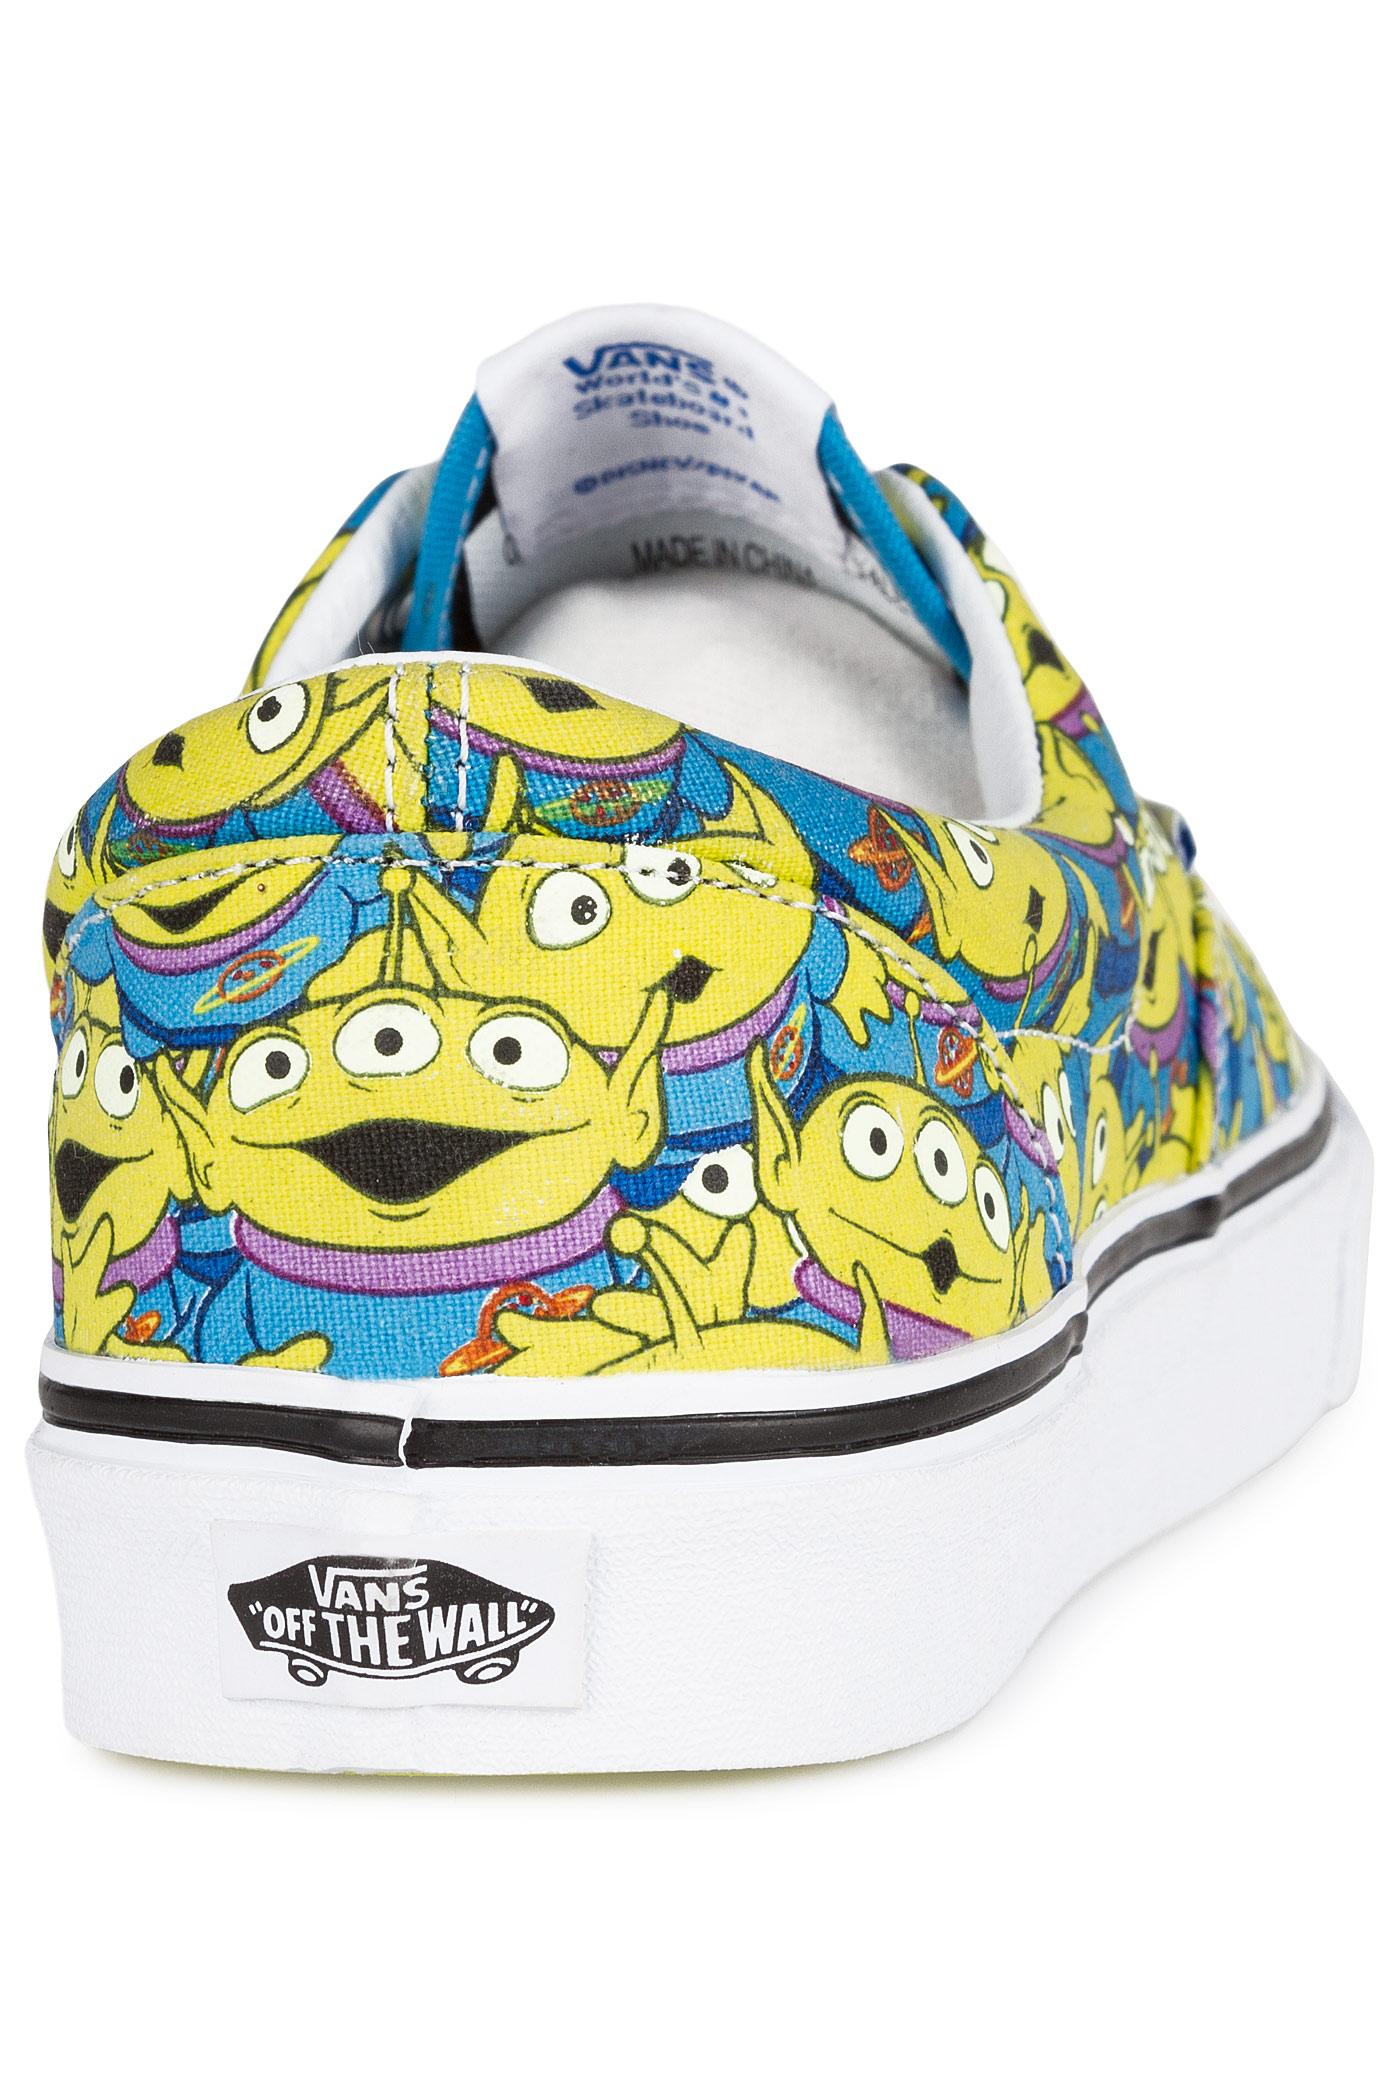 Vans X Toy Story Buy